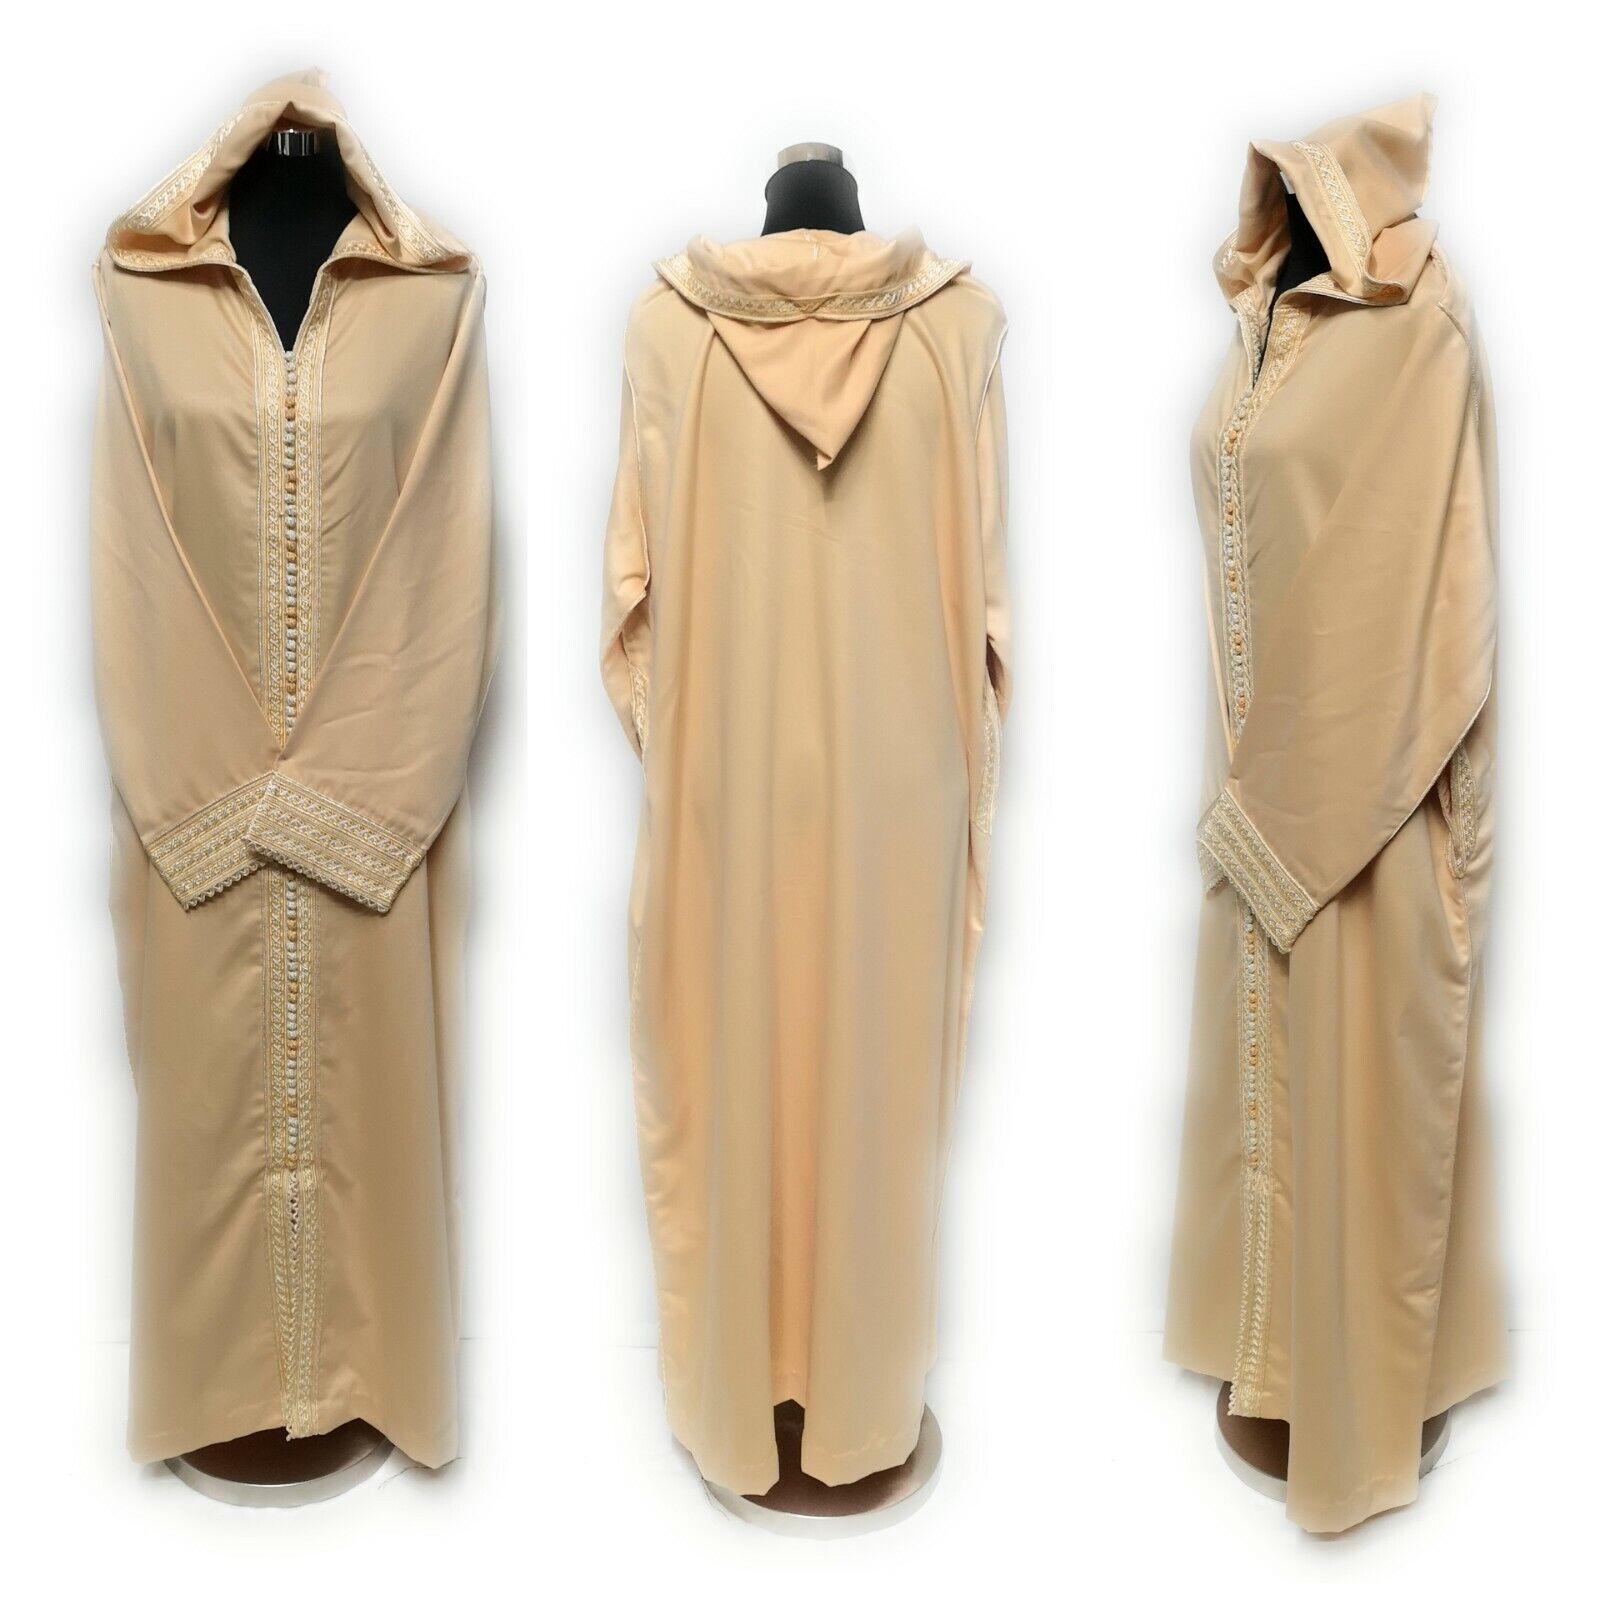 Damen Marokkanisch Wolle mit Kapuze Lang Maxi Kleid Djelleba Robe Enge Passform